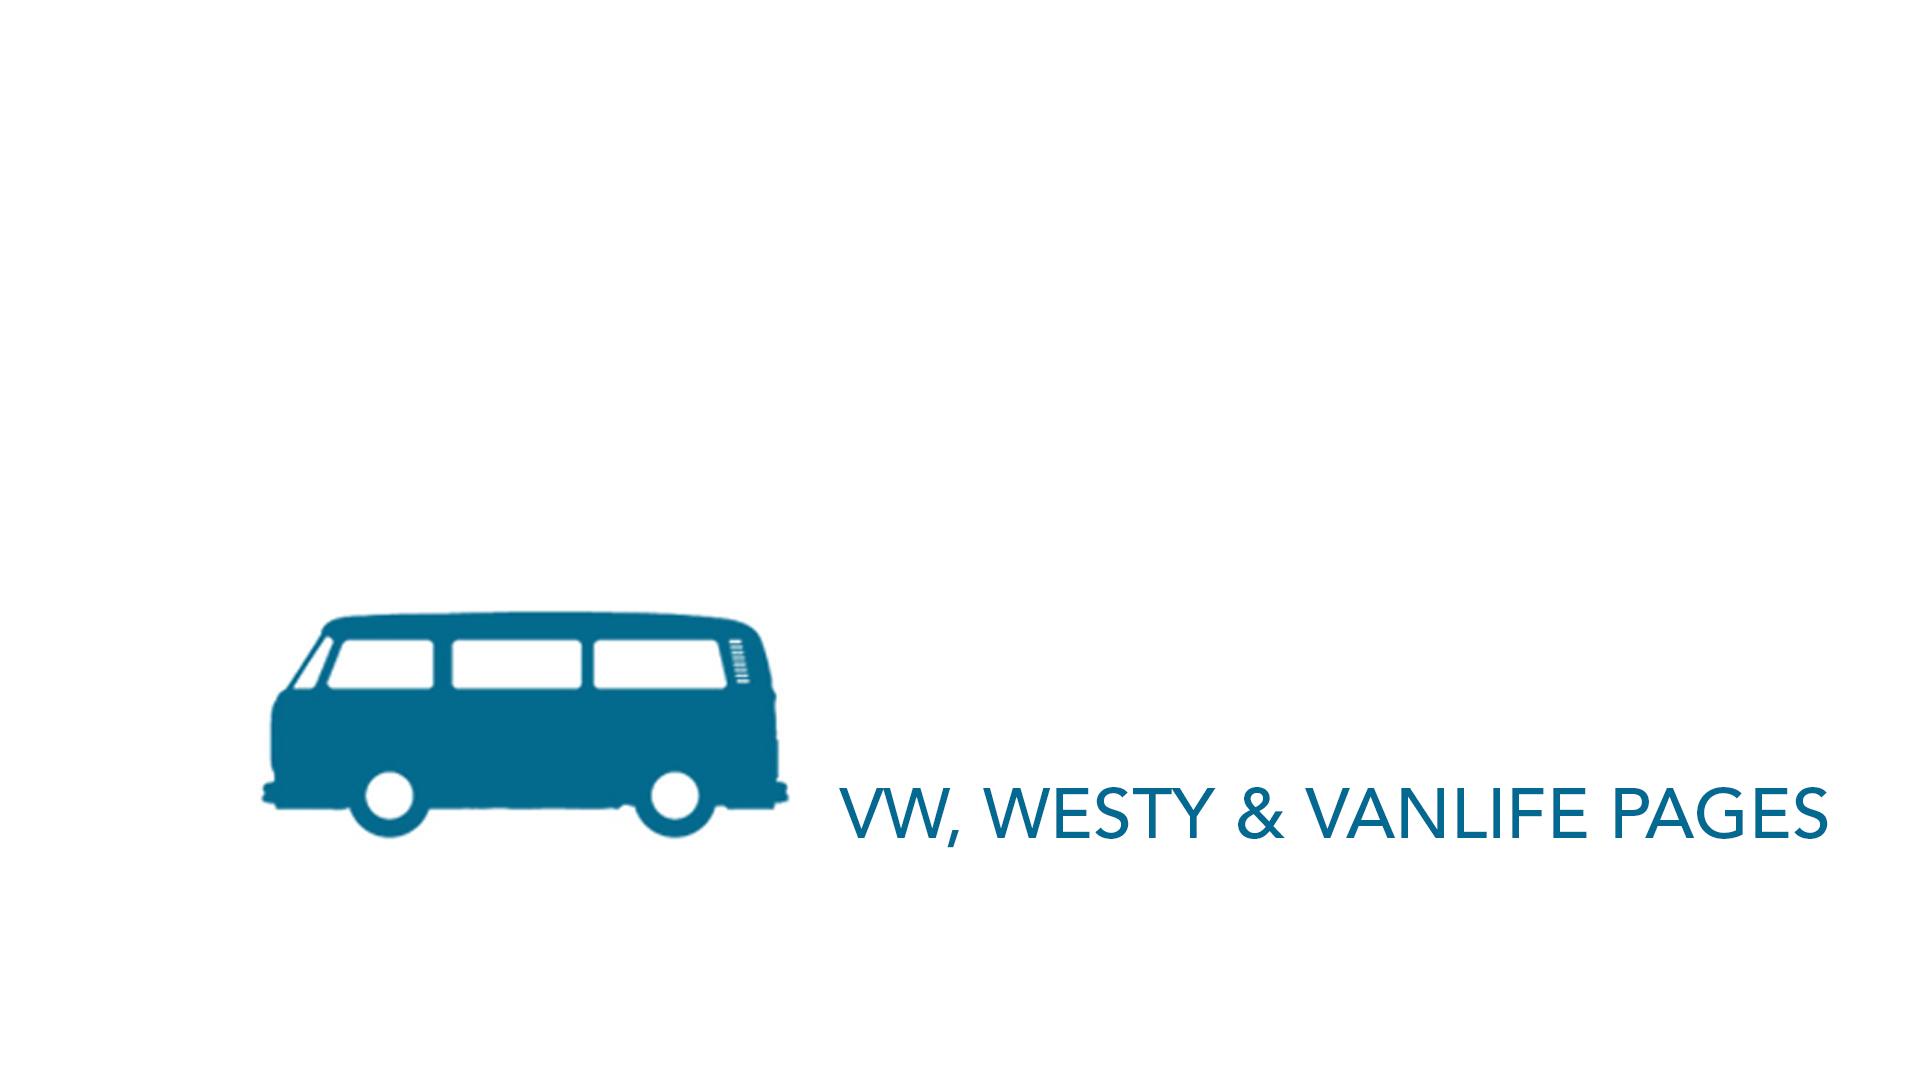 VW, Westfalia & Vanlife Groups –